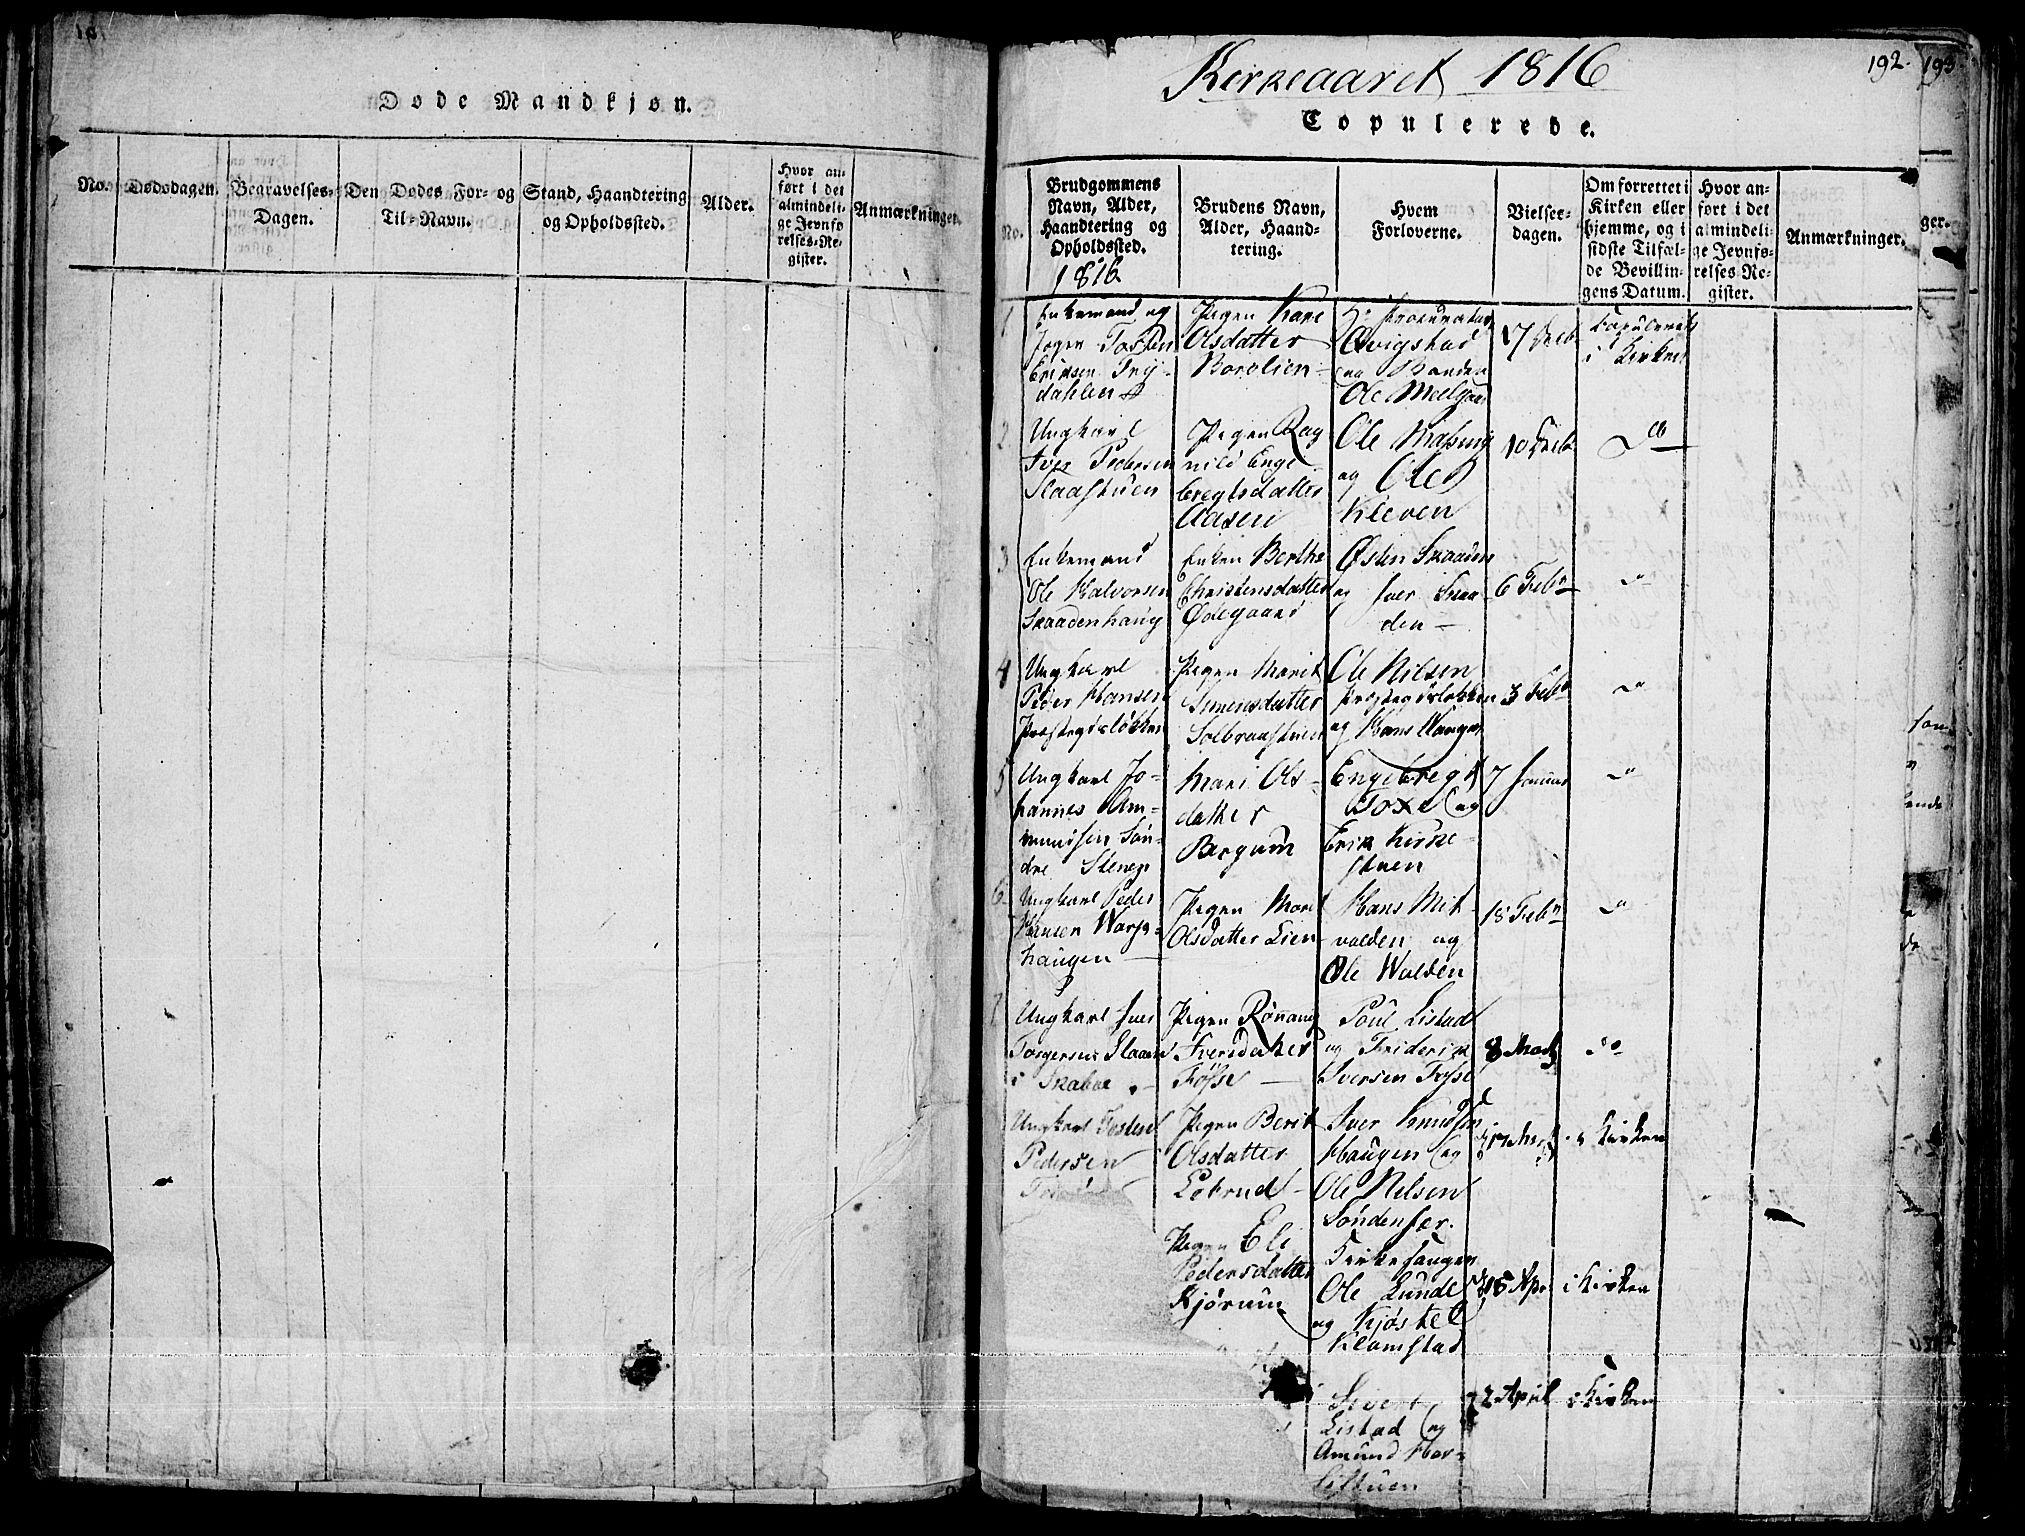 SAH, Fron prestekontor, H/Ha/Haa/L0002: Ministerialbok nr. 2, 1816-1827, s. 192